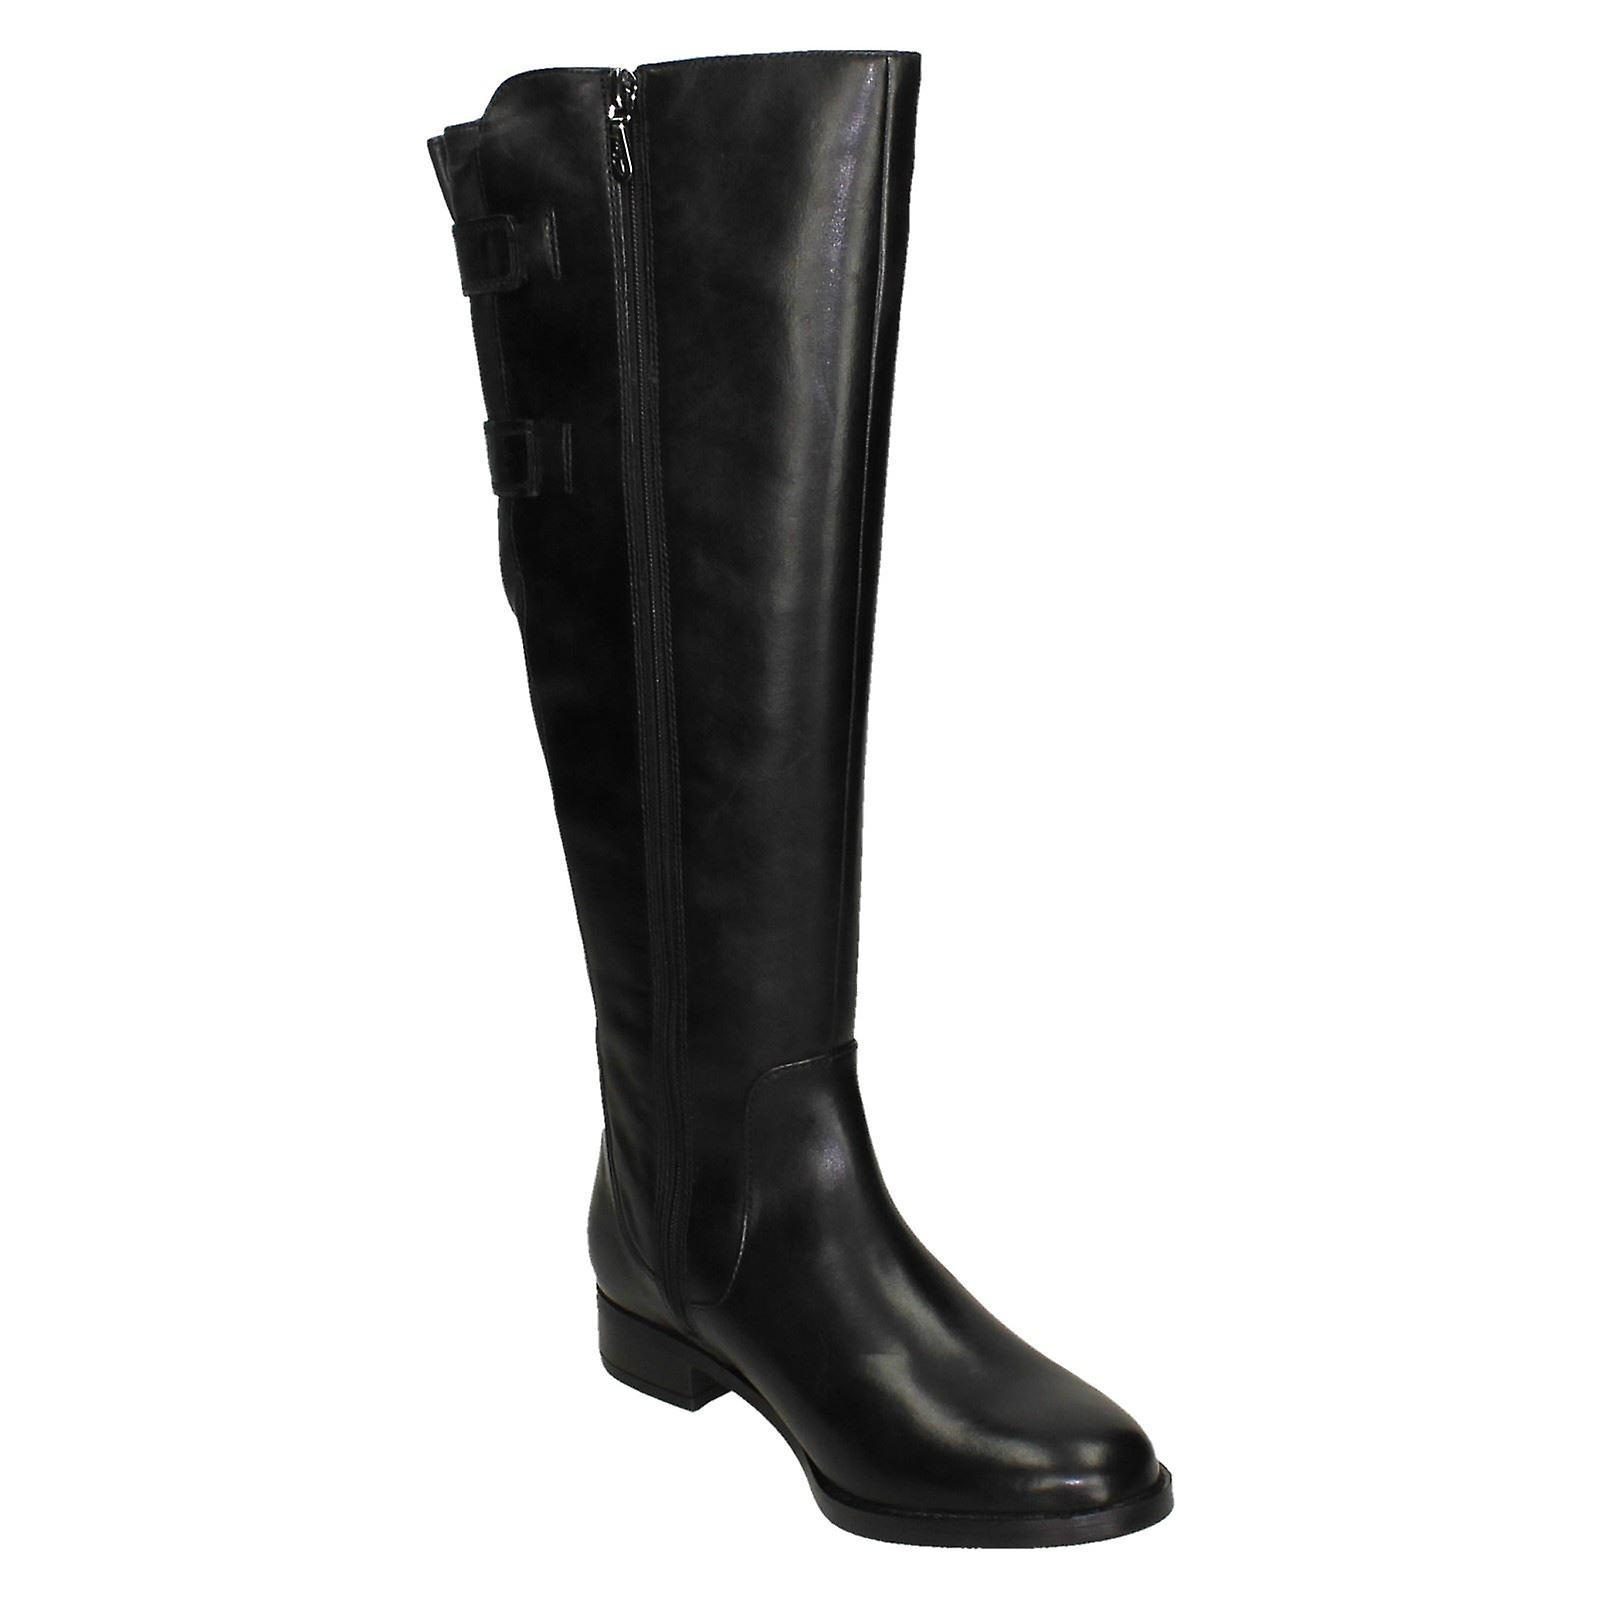 Damer Clarks knæ høje støvler Netley ride